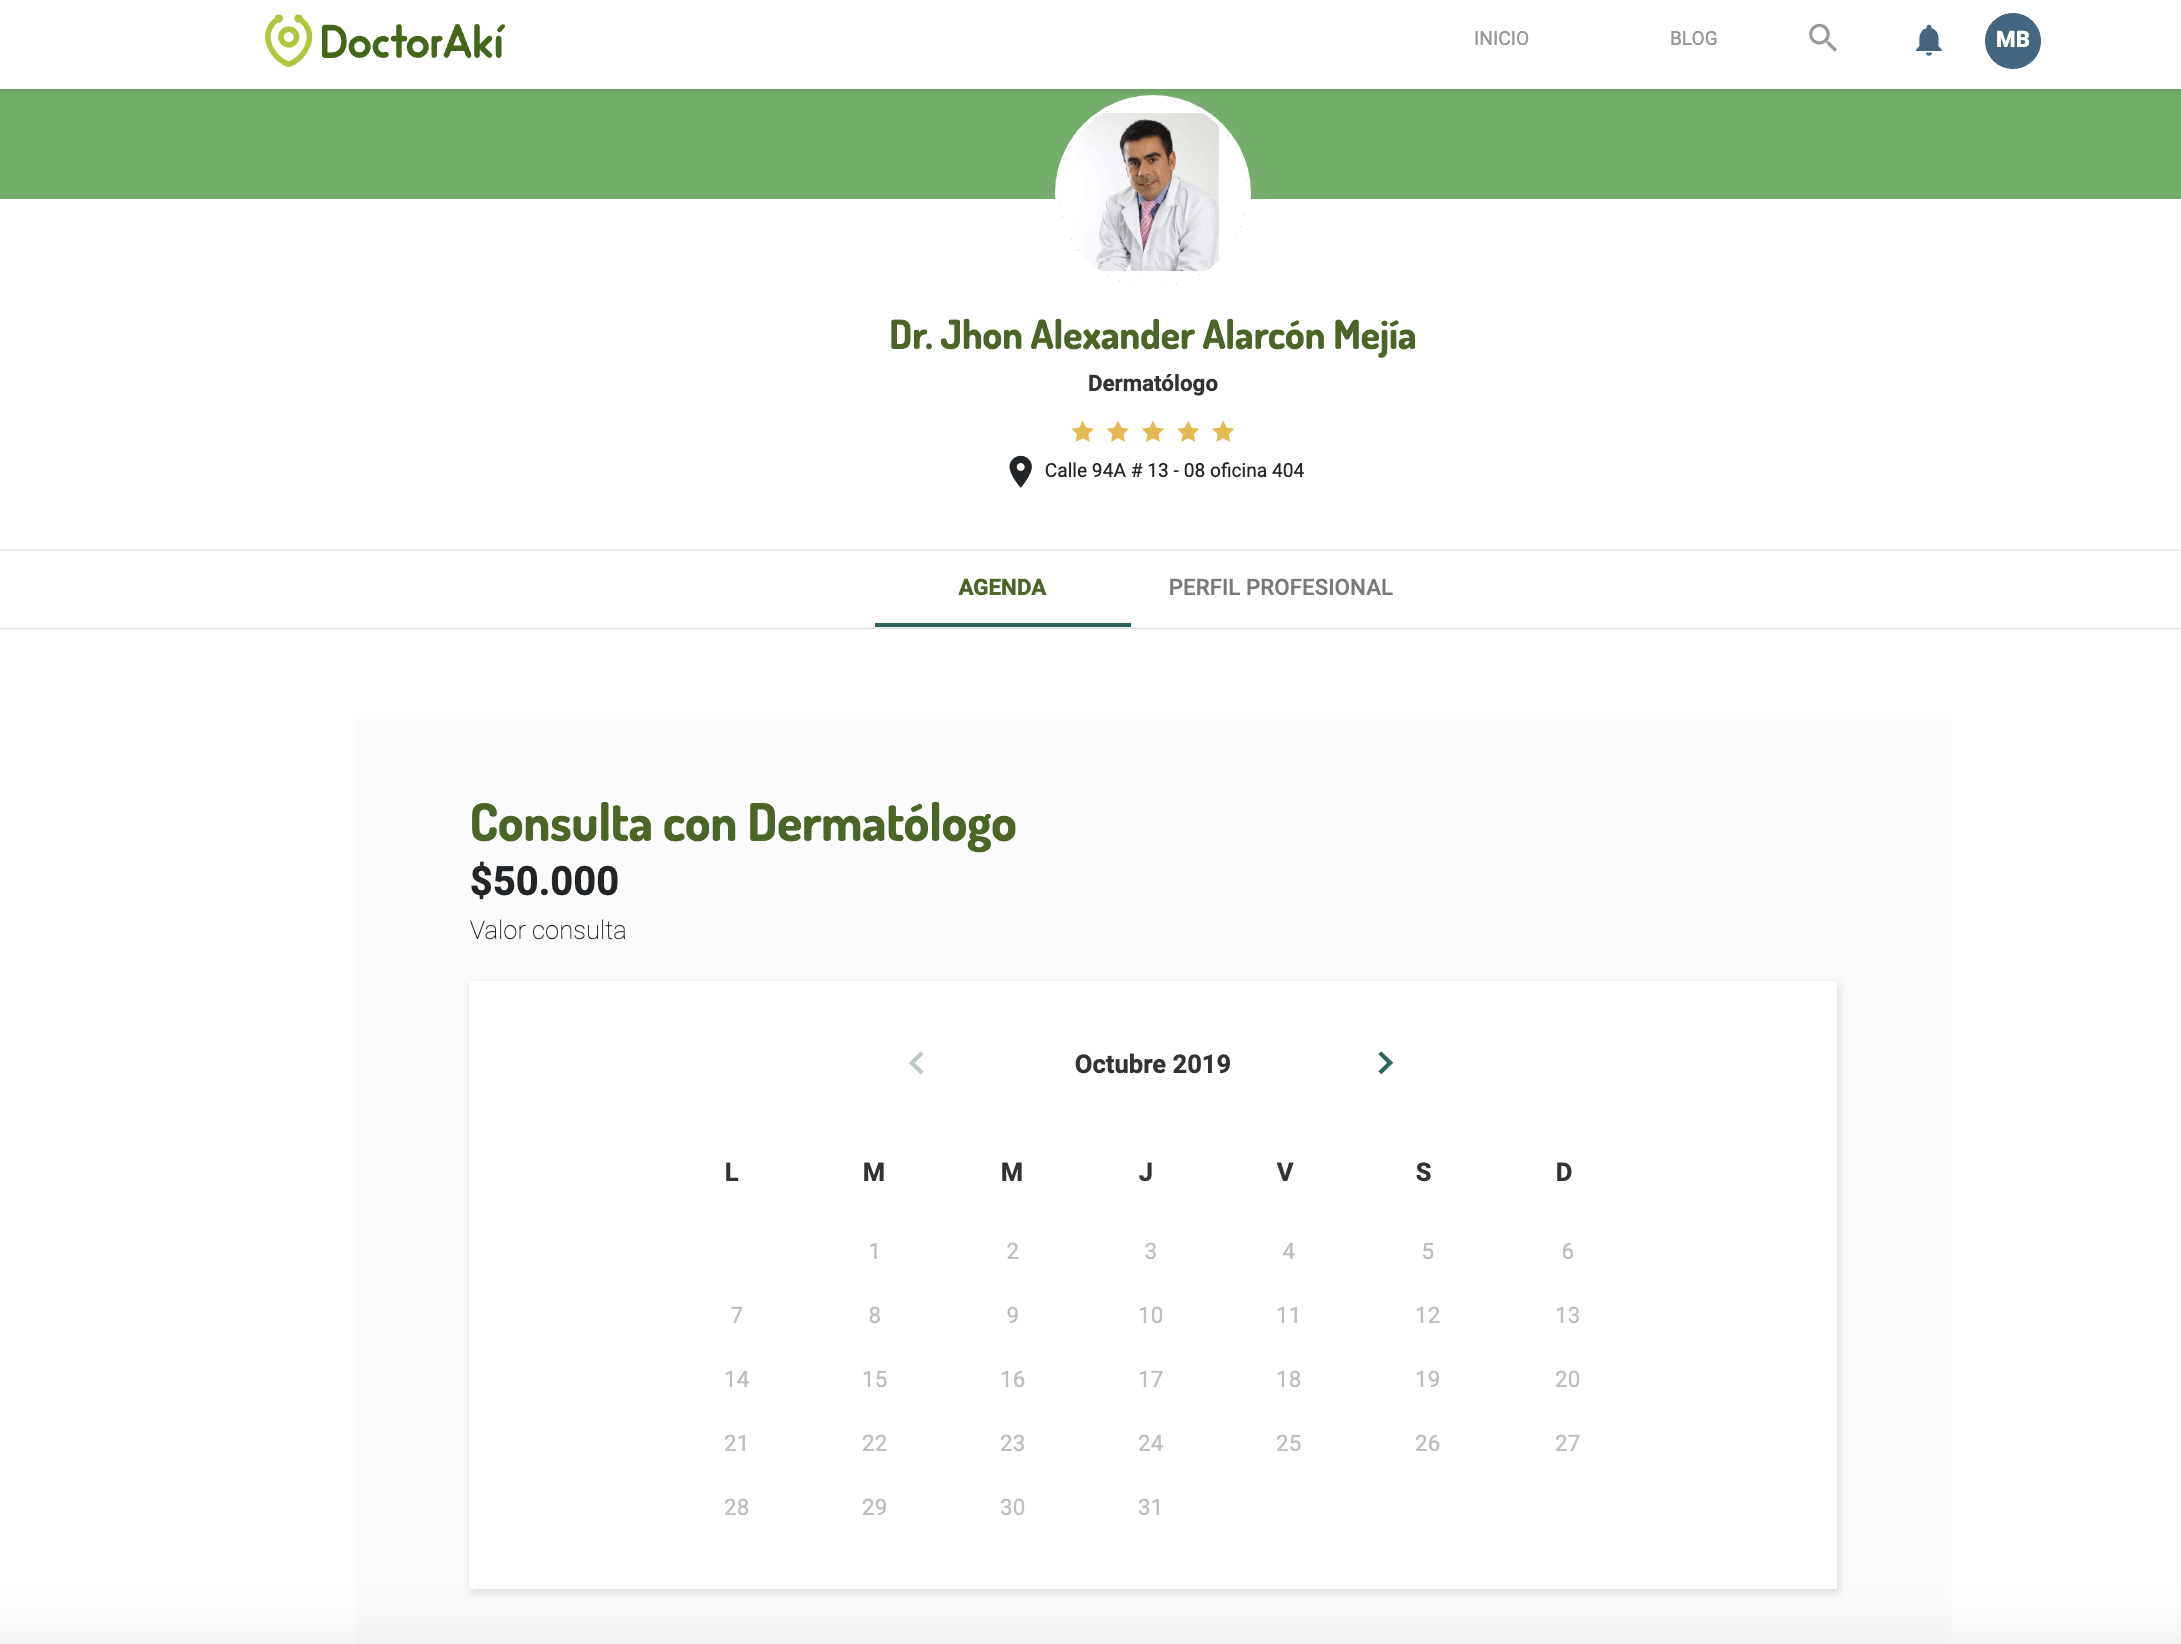 Agenda medicos DoctorAki